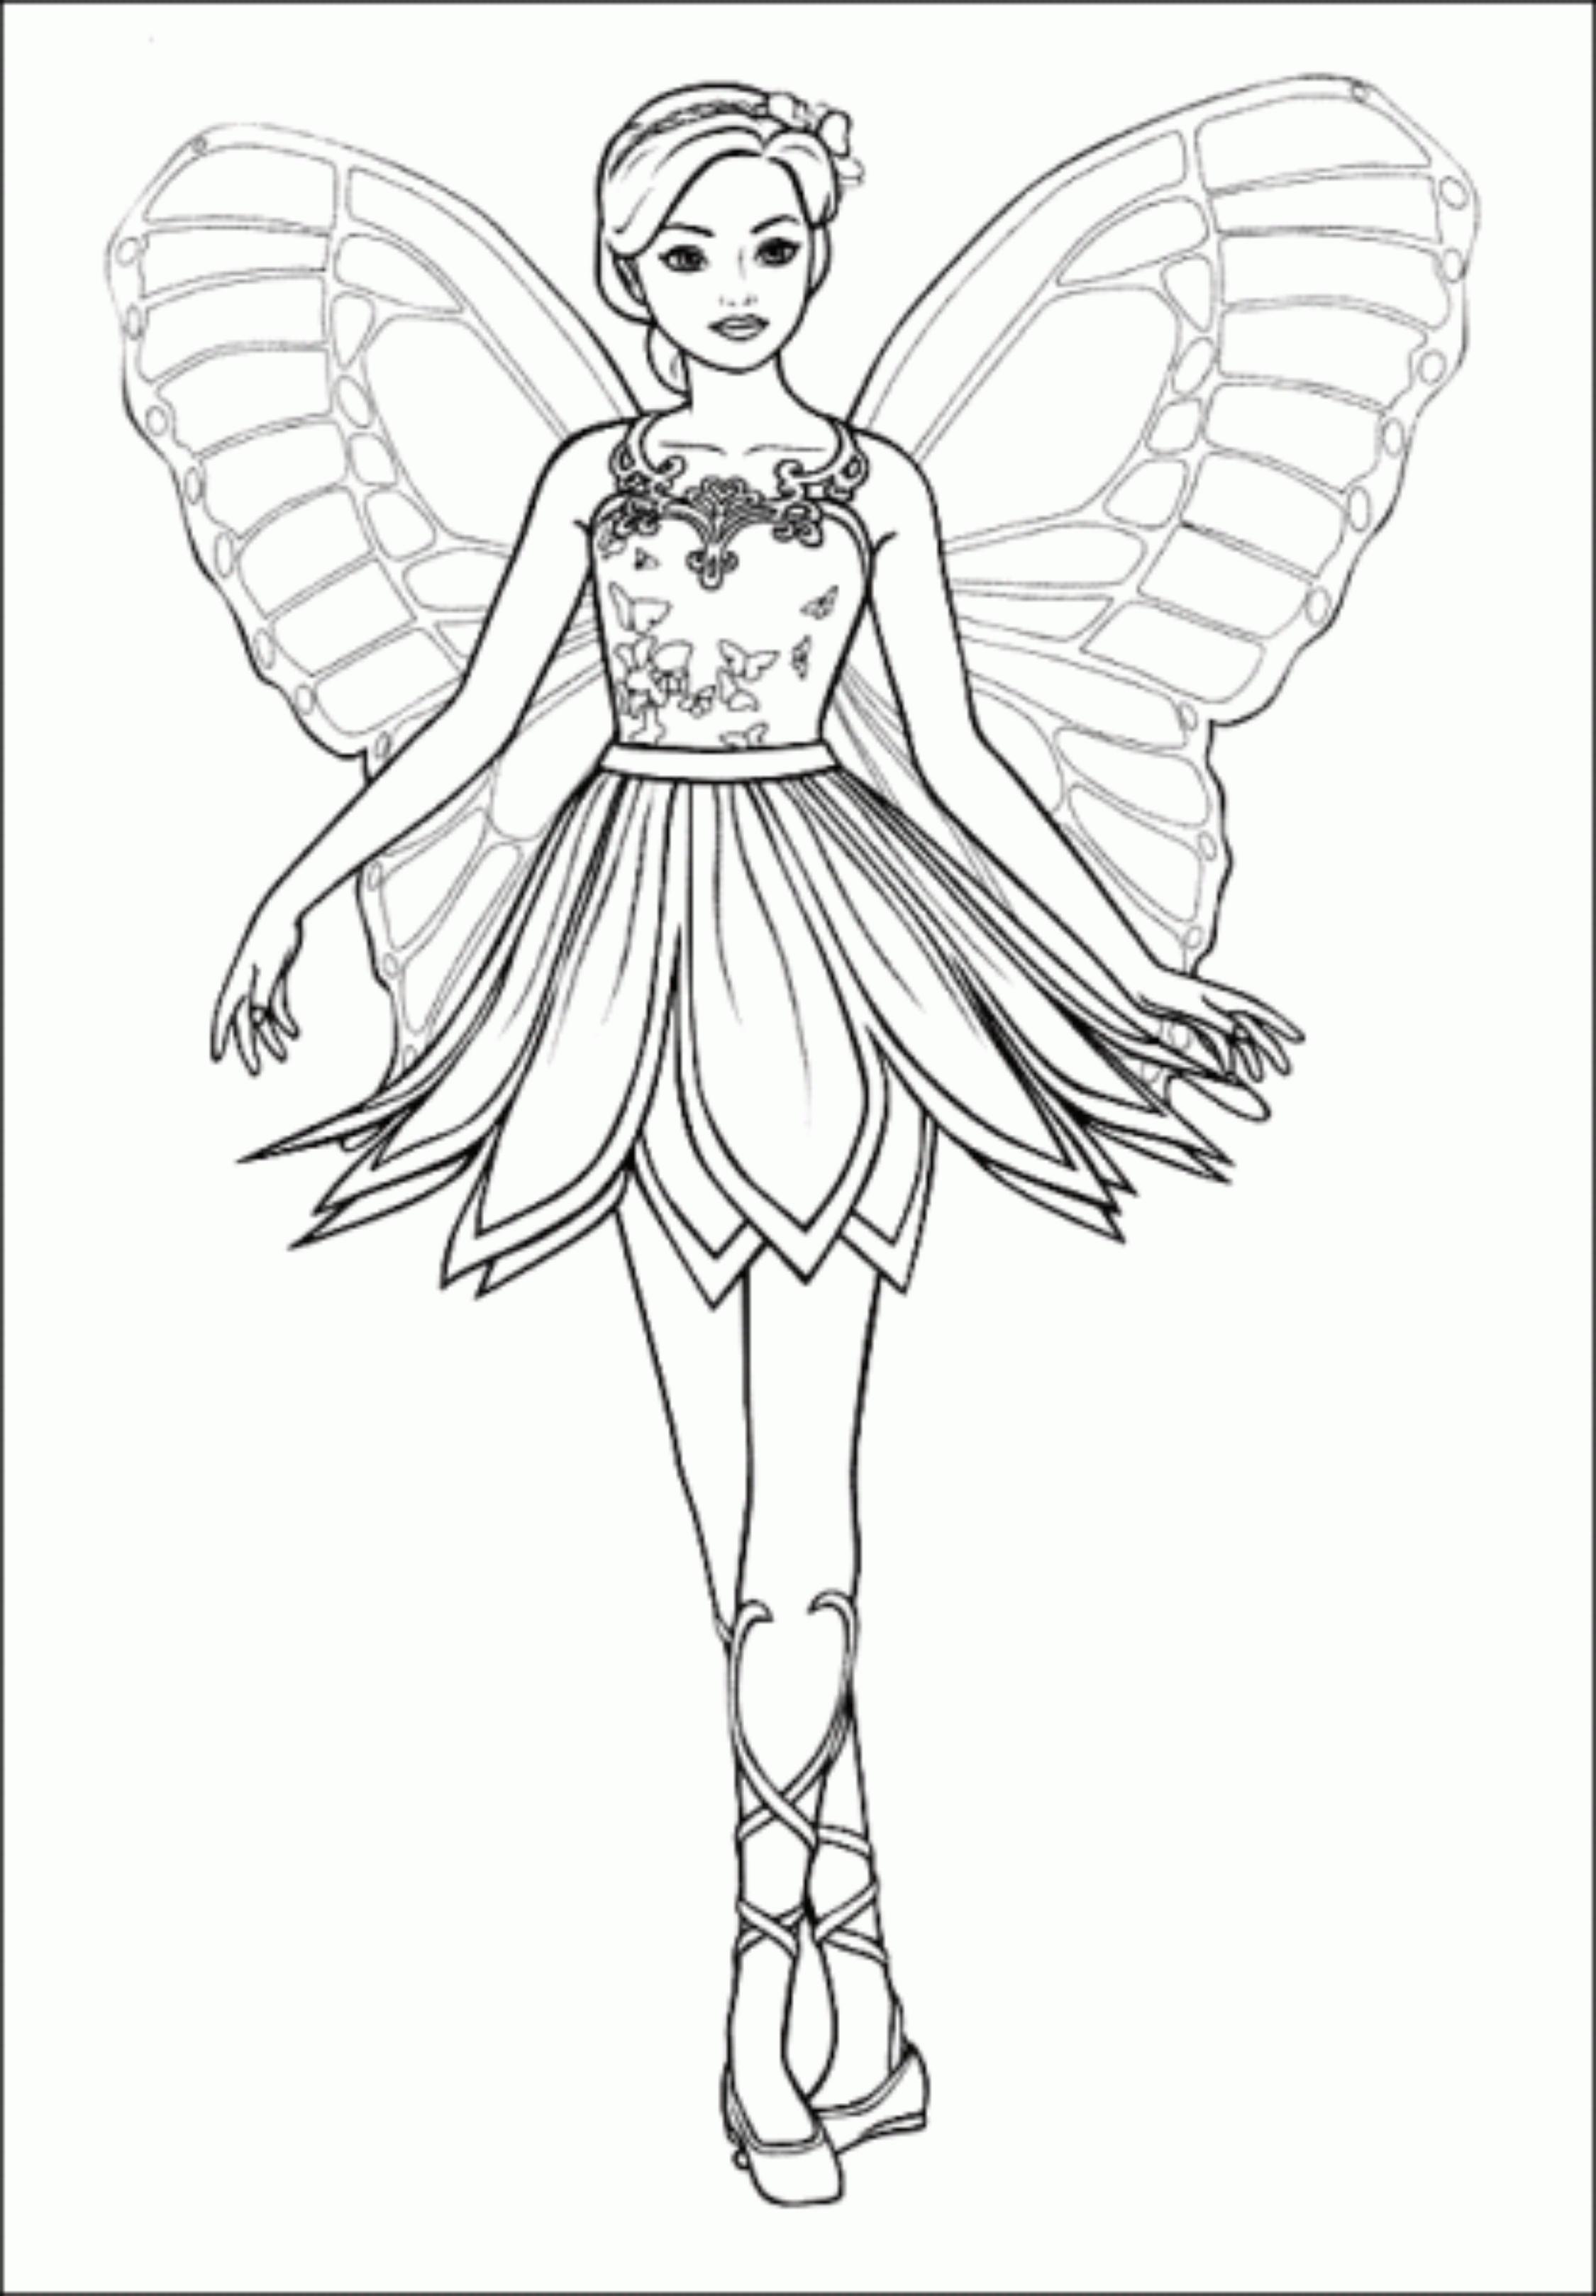 2250x3237 Pencil Sketch Barbie Images Gallery Pencil Sketches Of Barbie